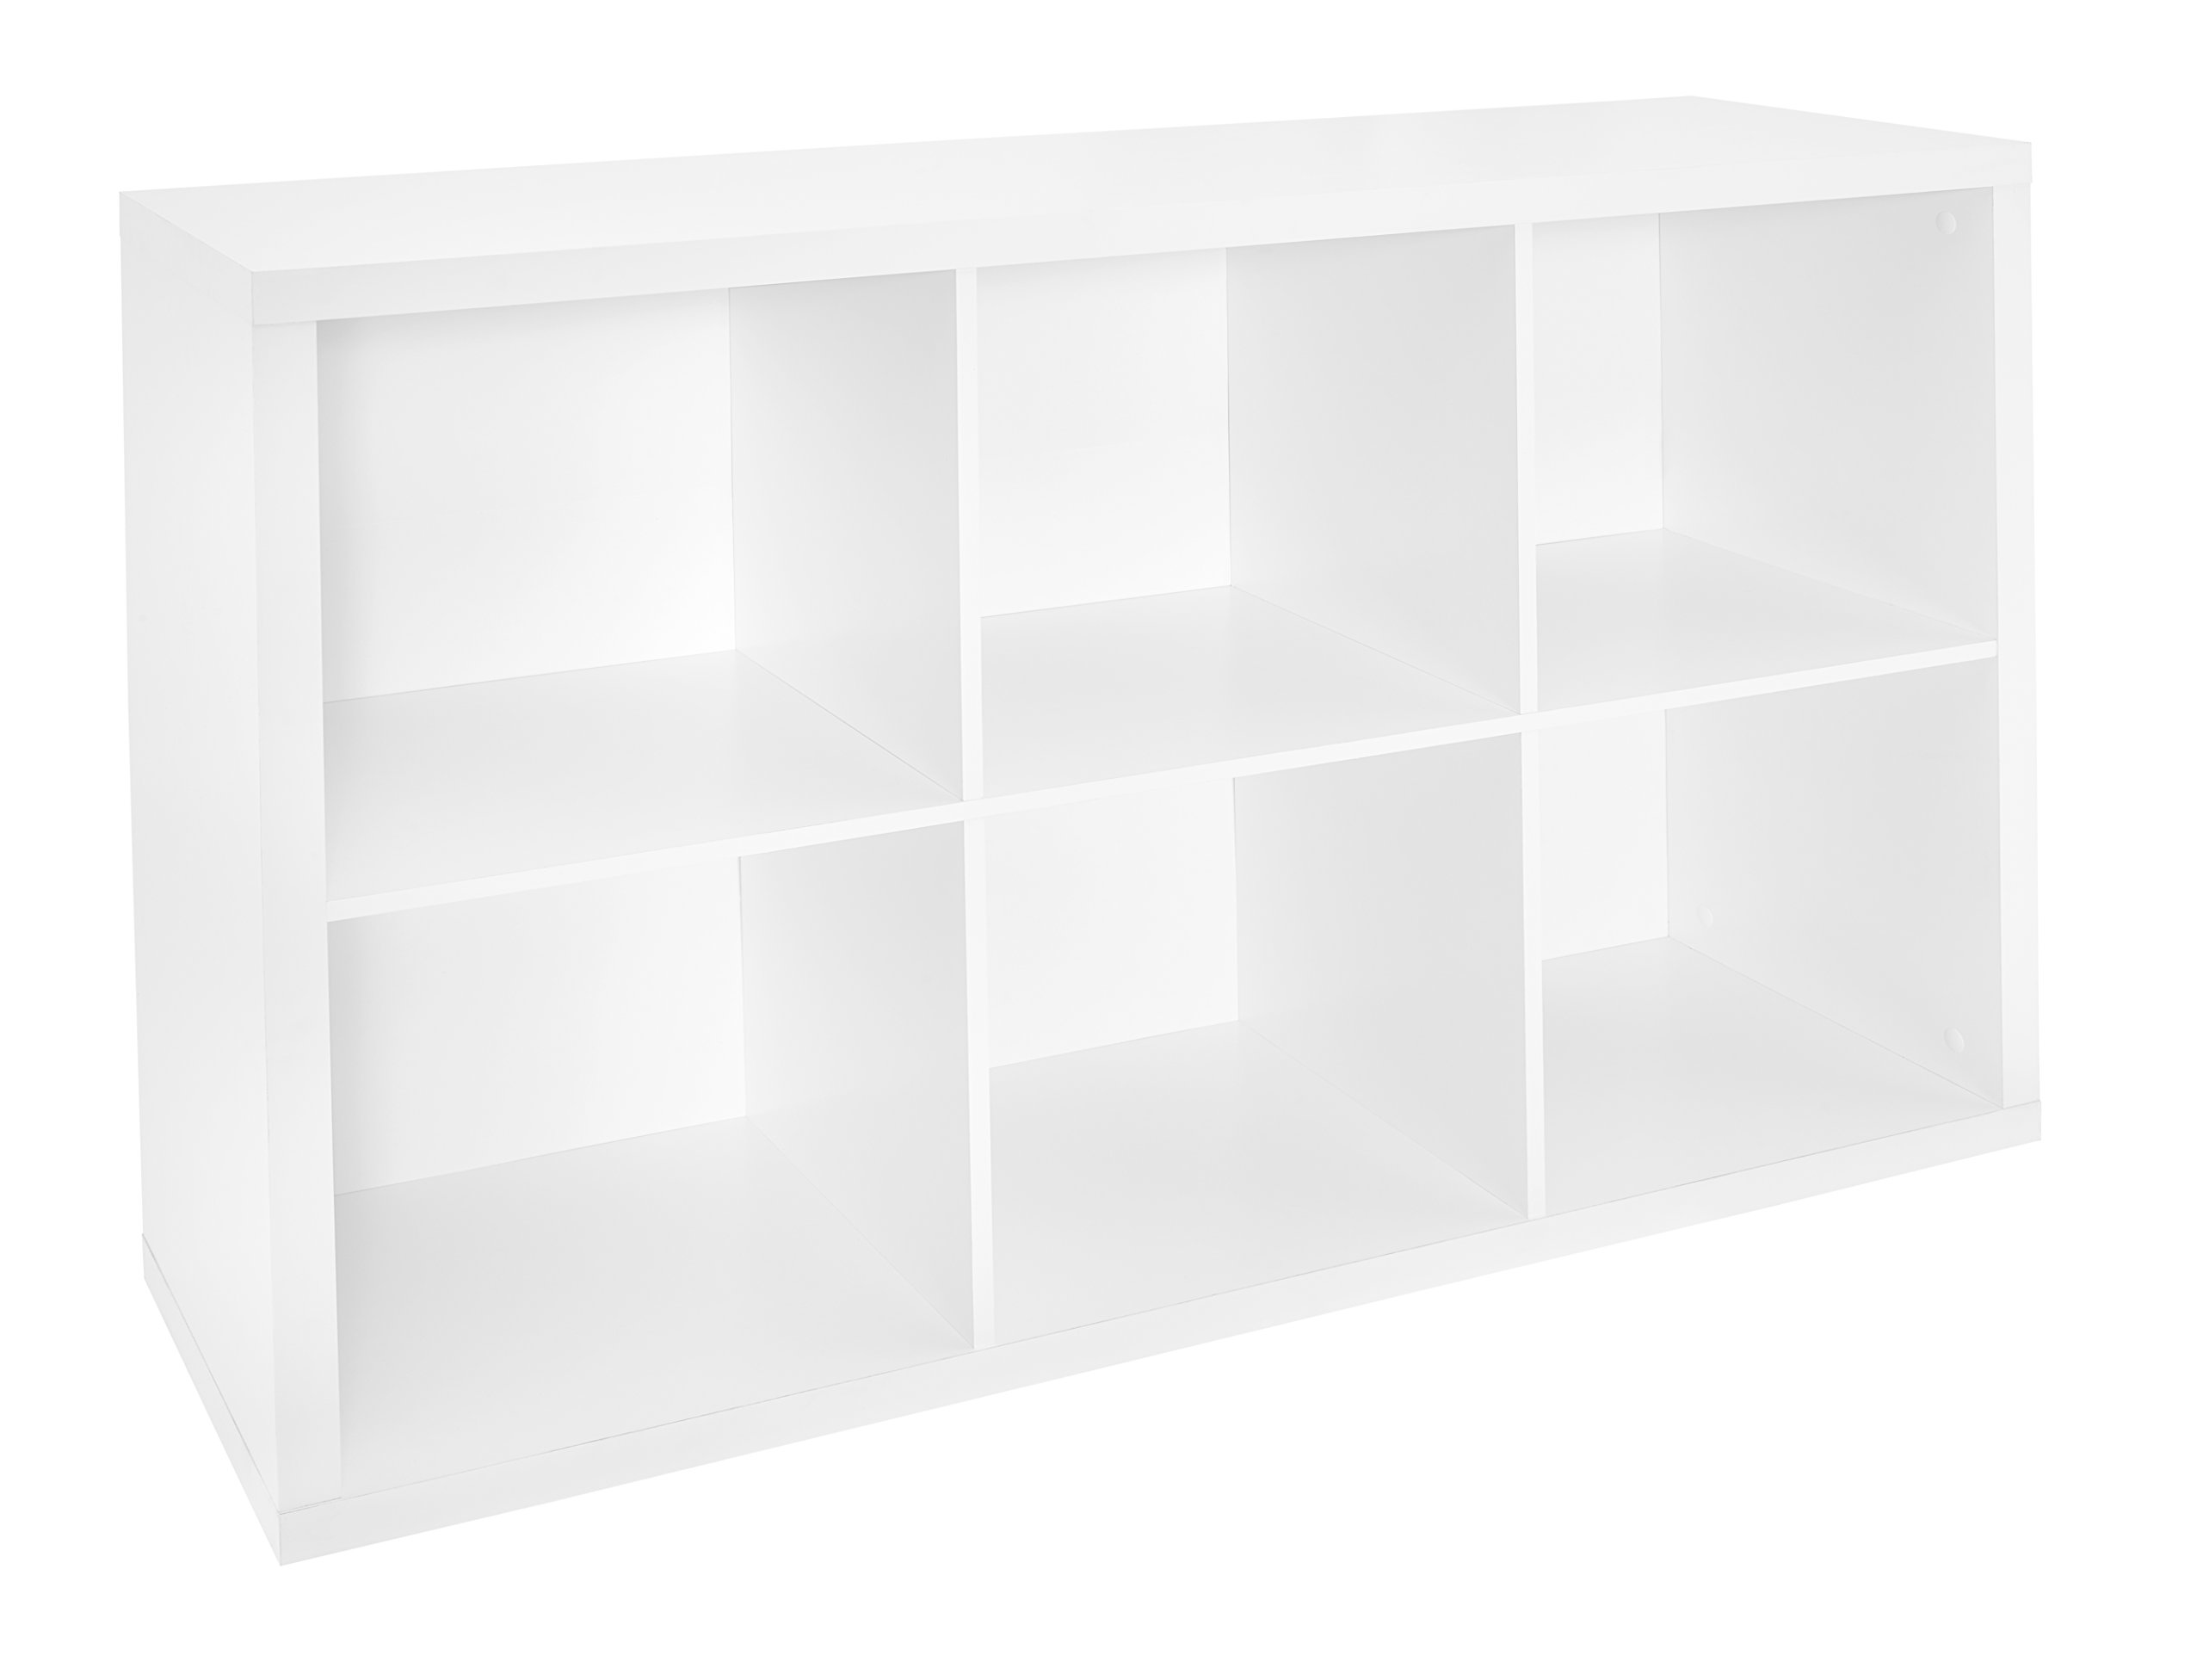 ClosetMaid 1109 Decorative 6-Cube Storage Organizer, White by ClosetMaid